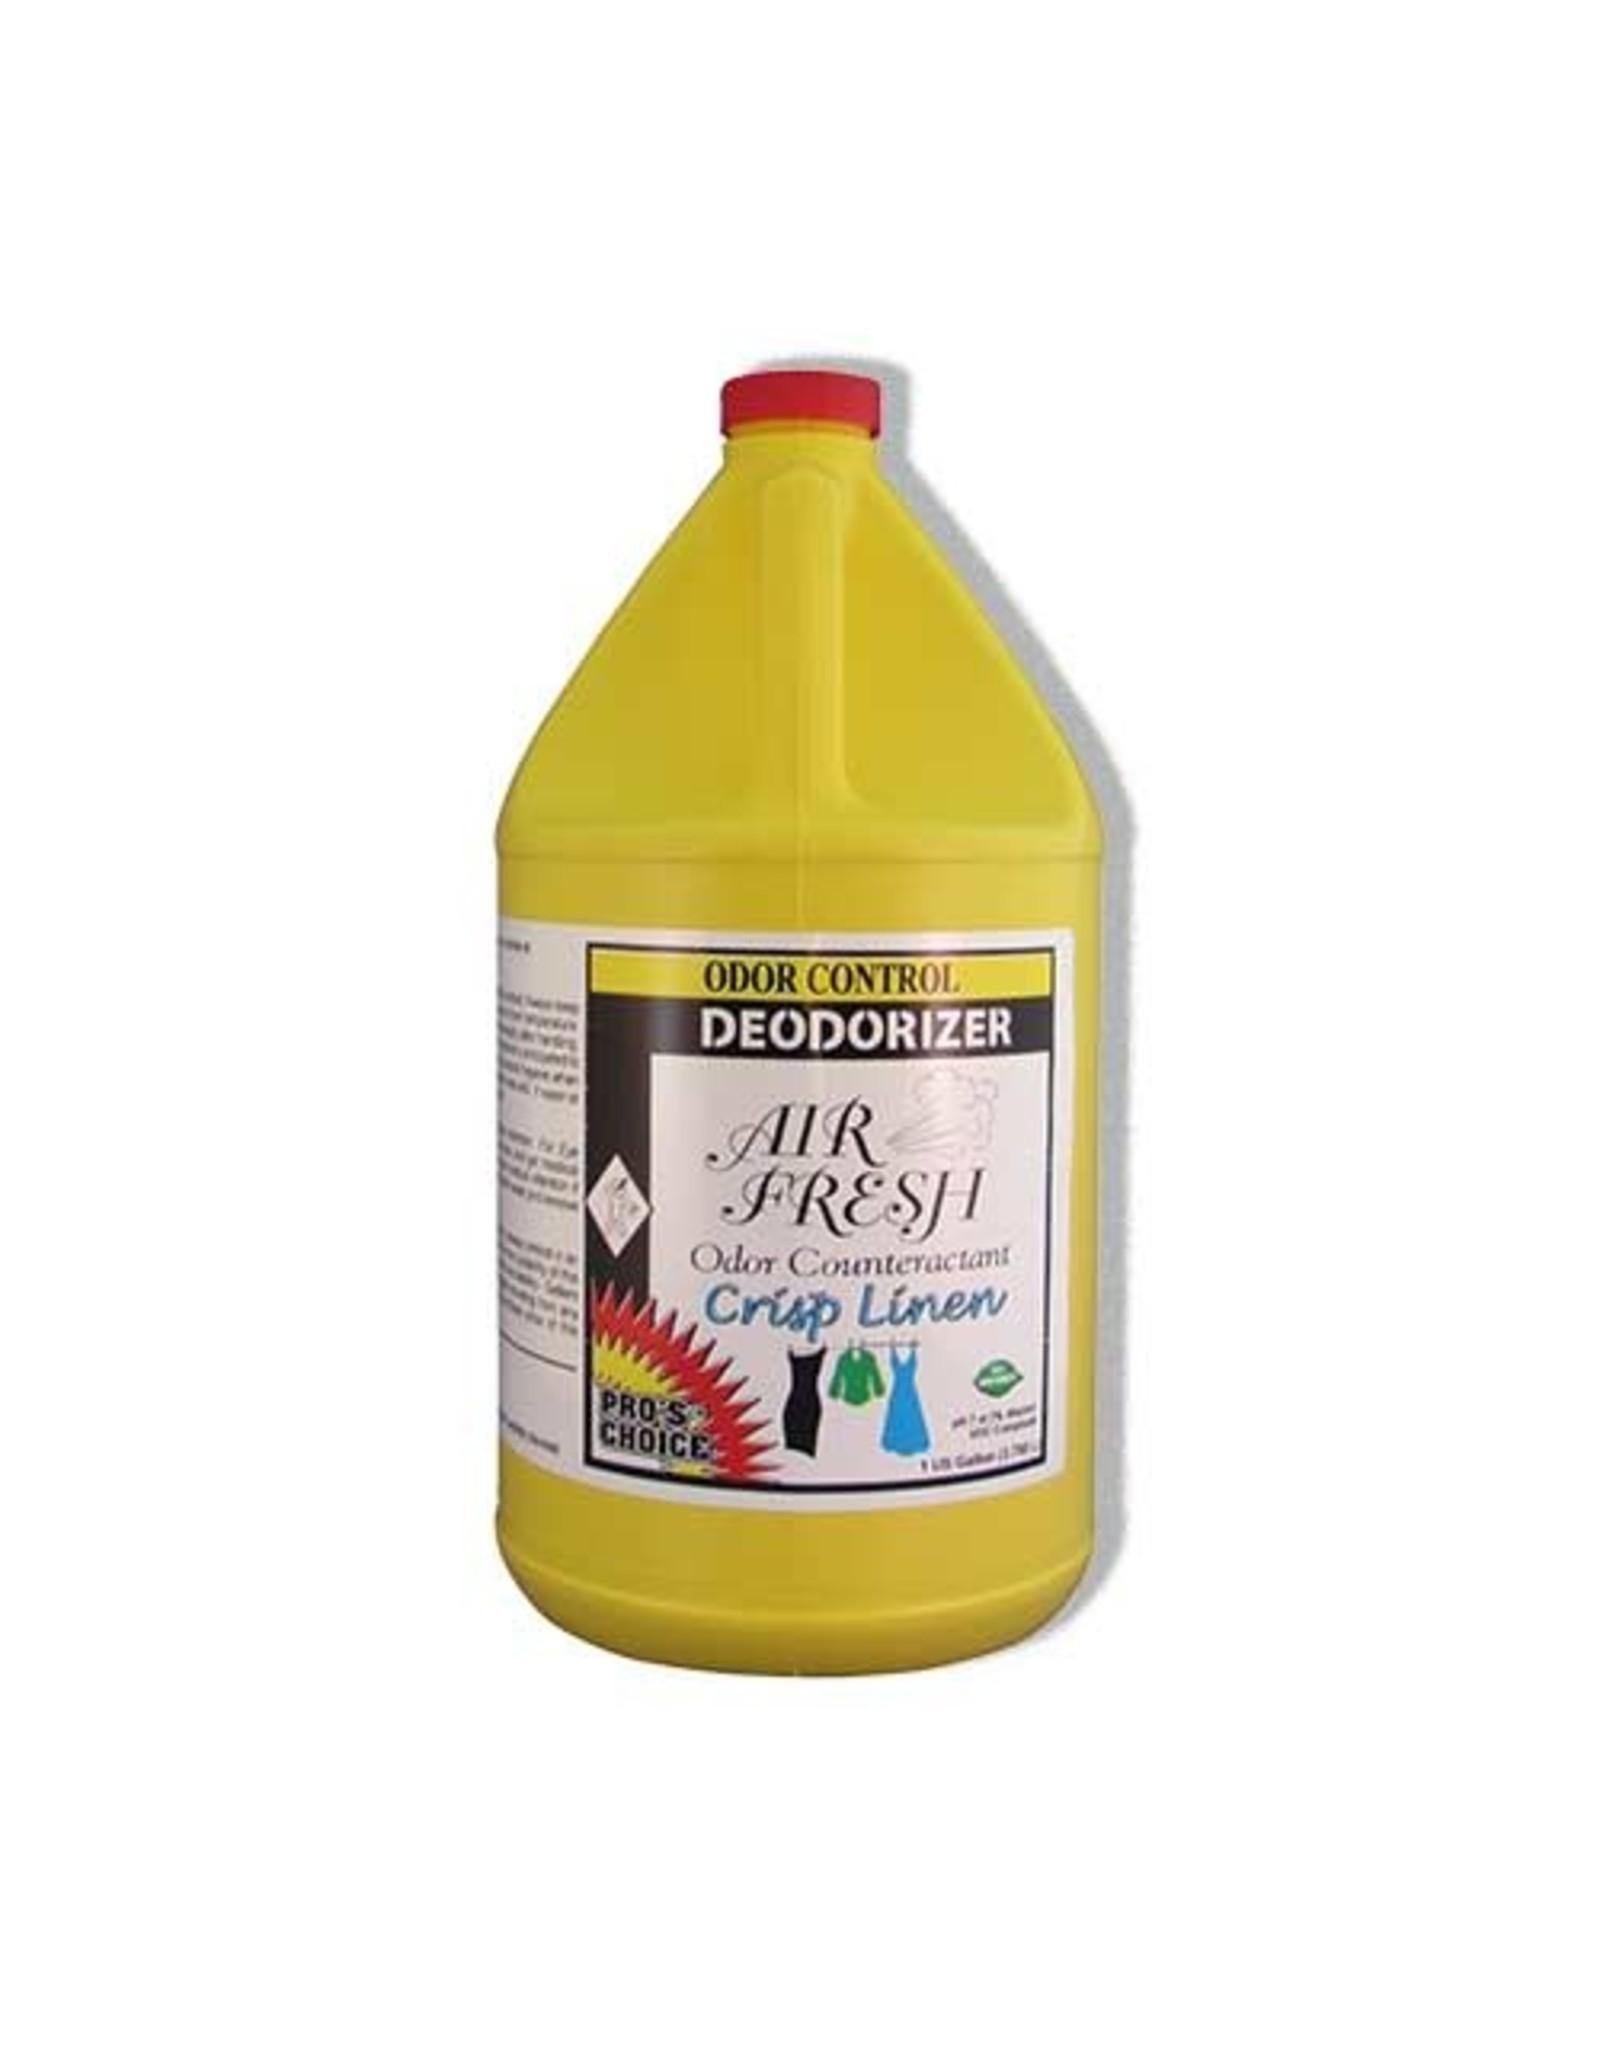 Pro's Choice Air Fresh Crisp Linen